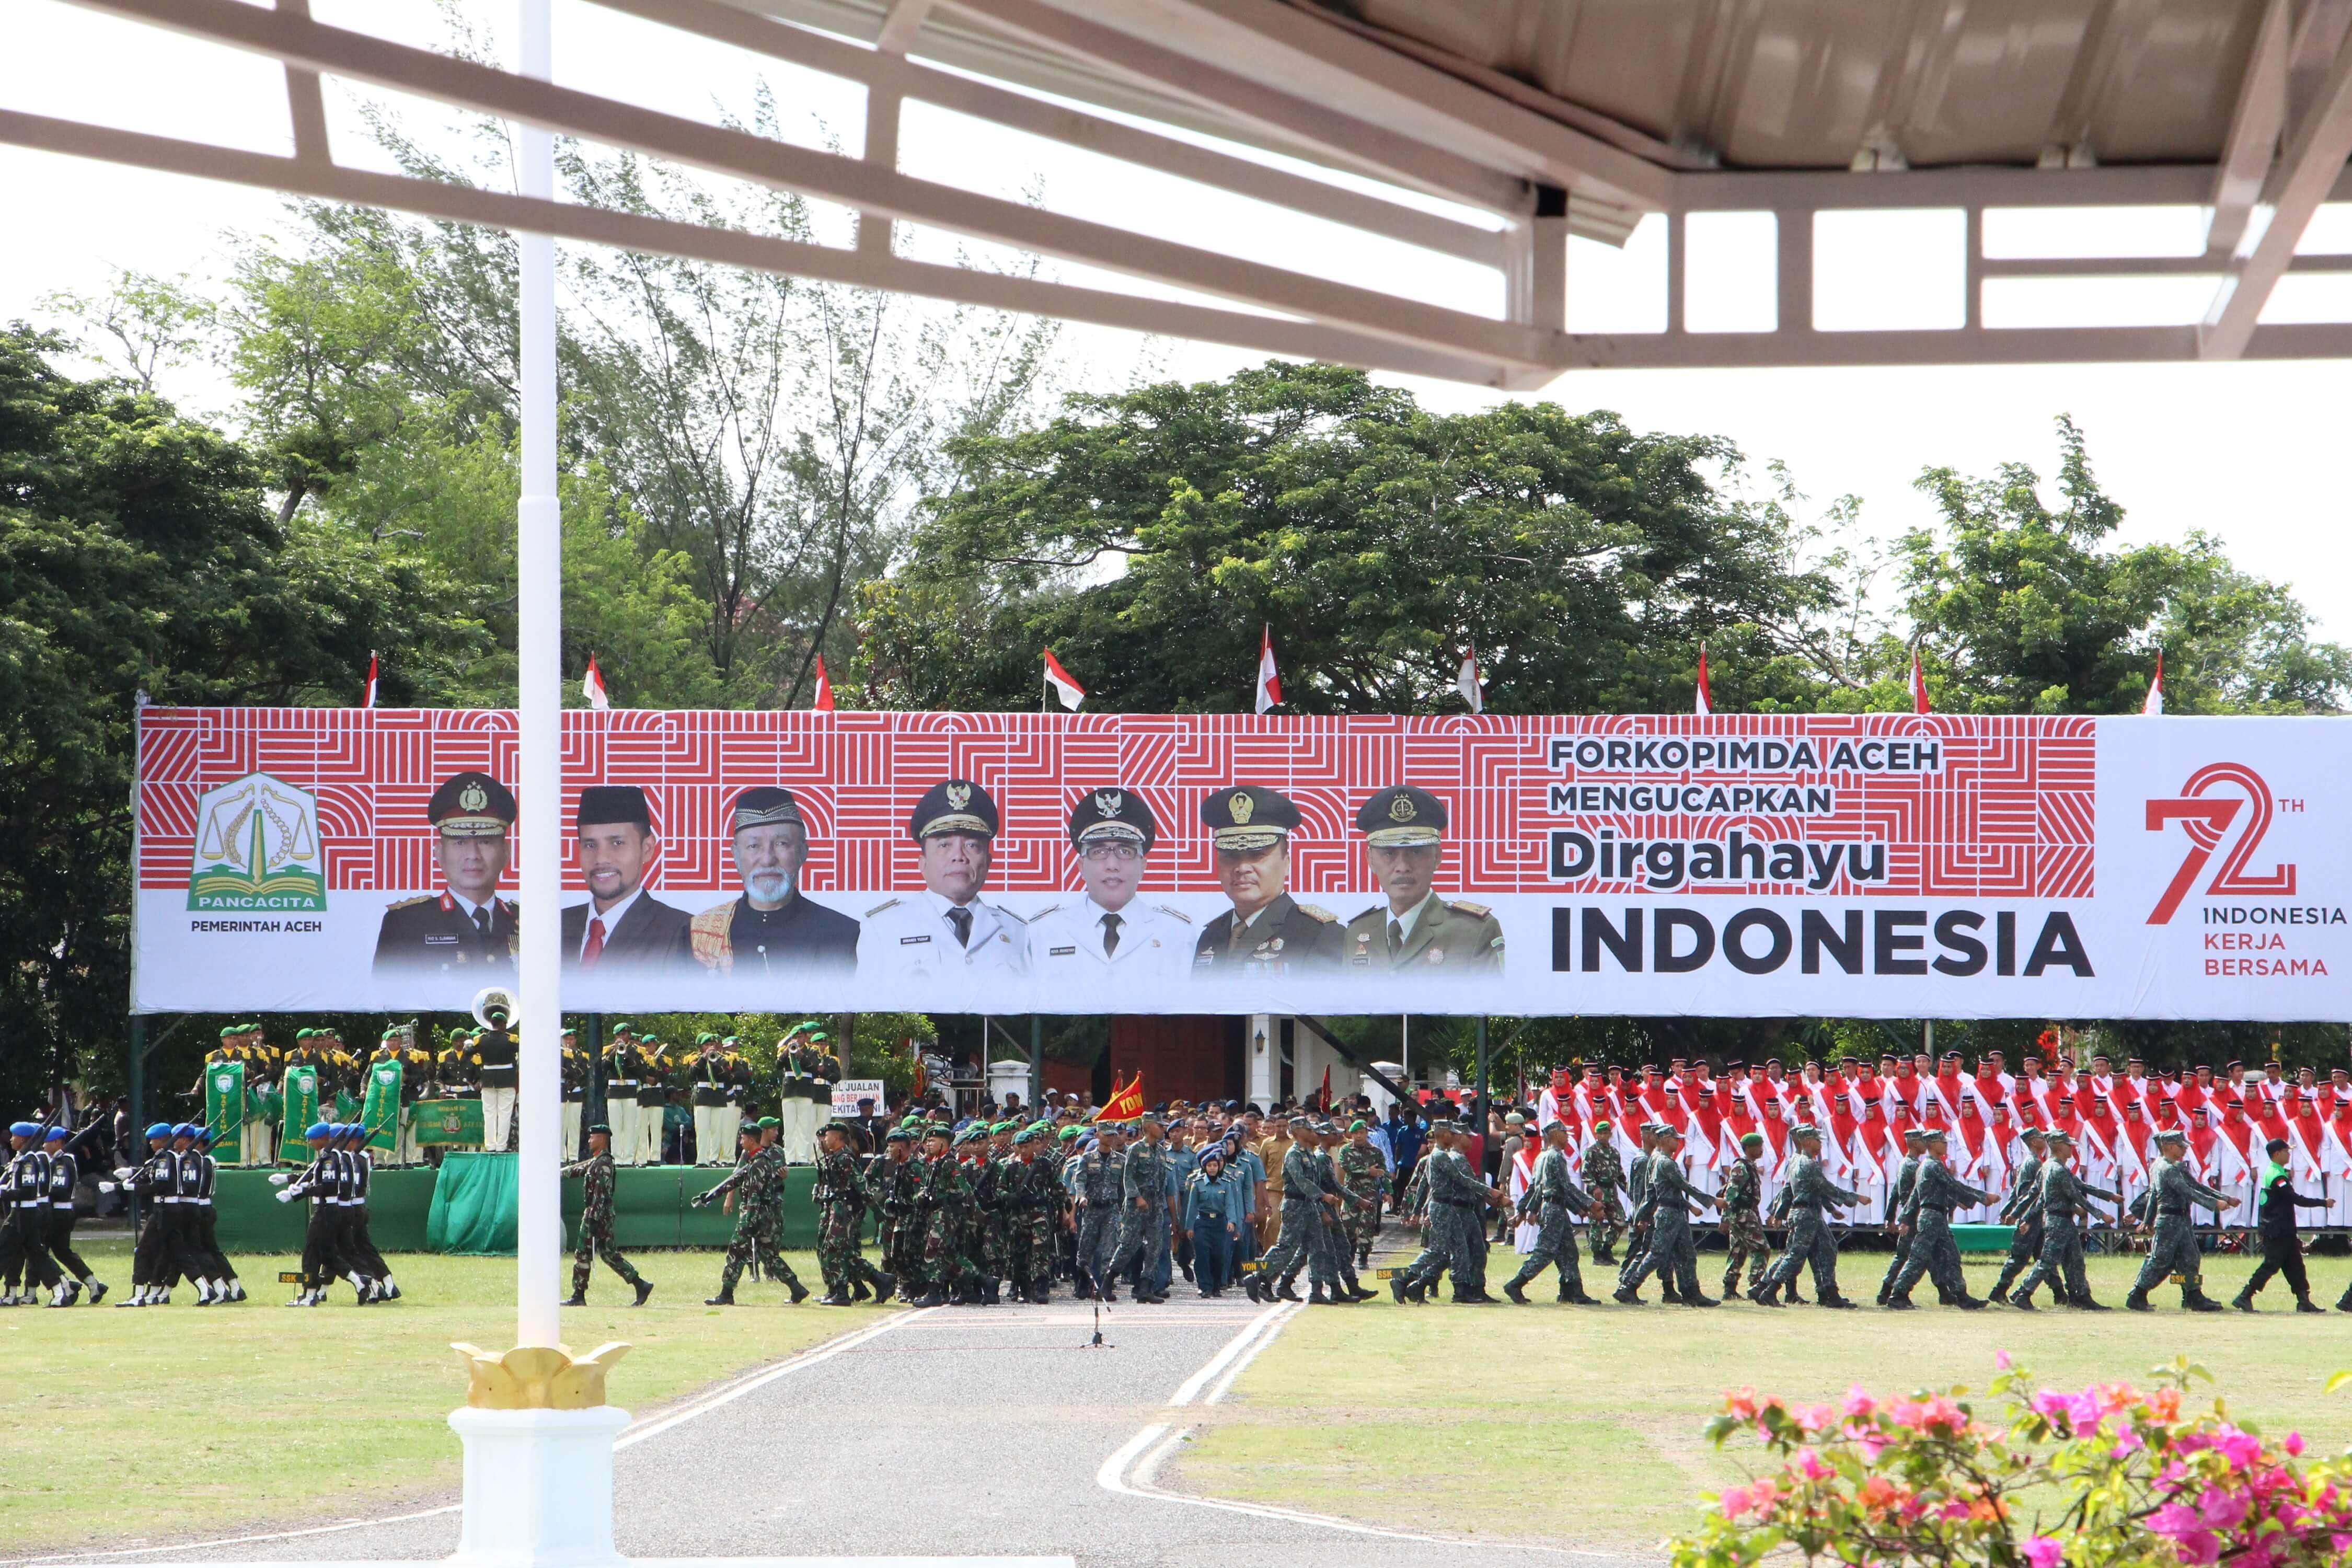 Kepala Kanwil Djpbn Prov Aceh Menghadiri Upacara Kemerdekaan Lapangan Blang